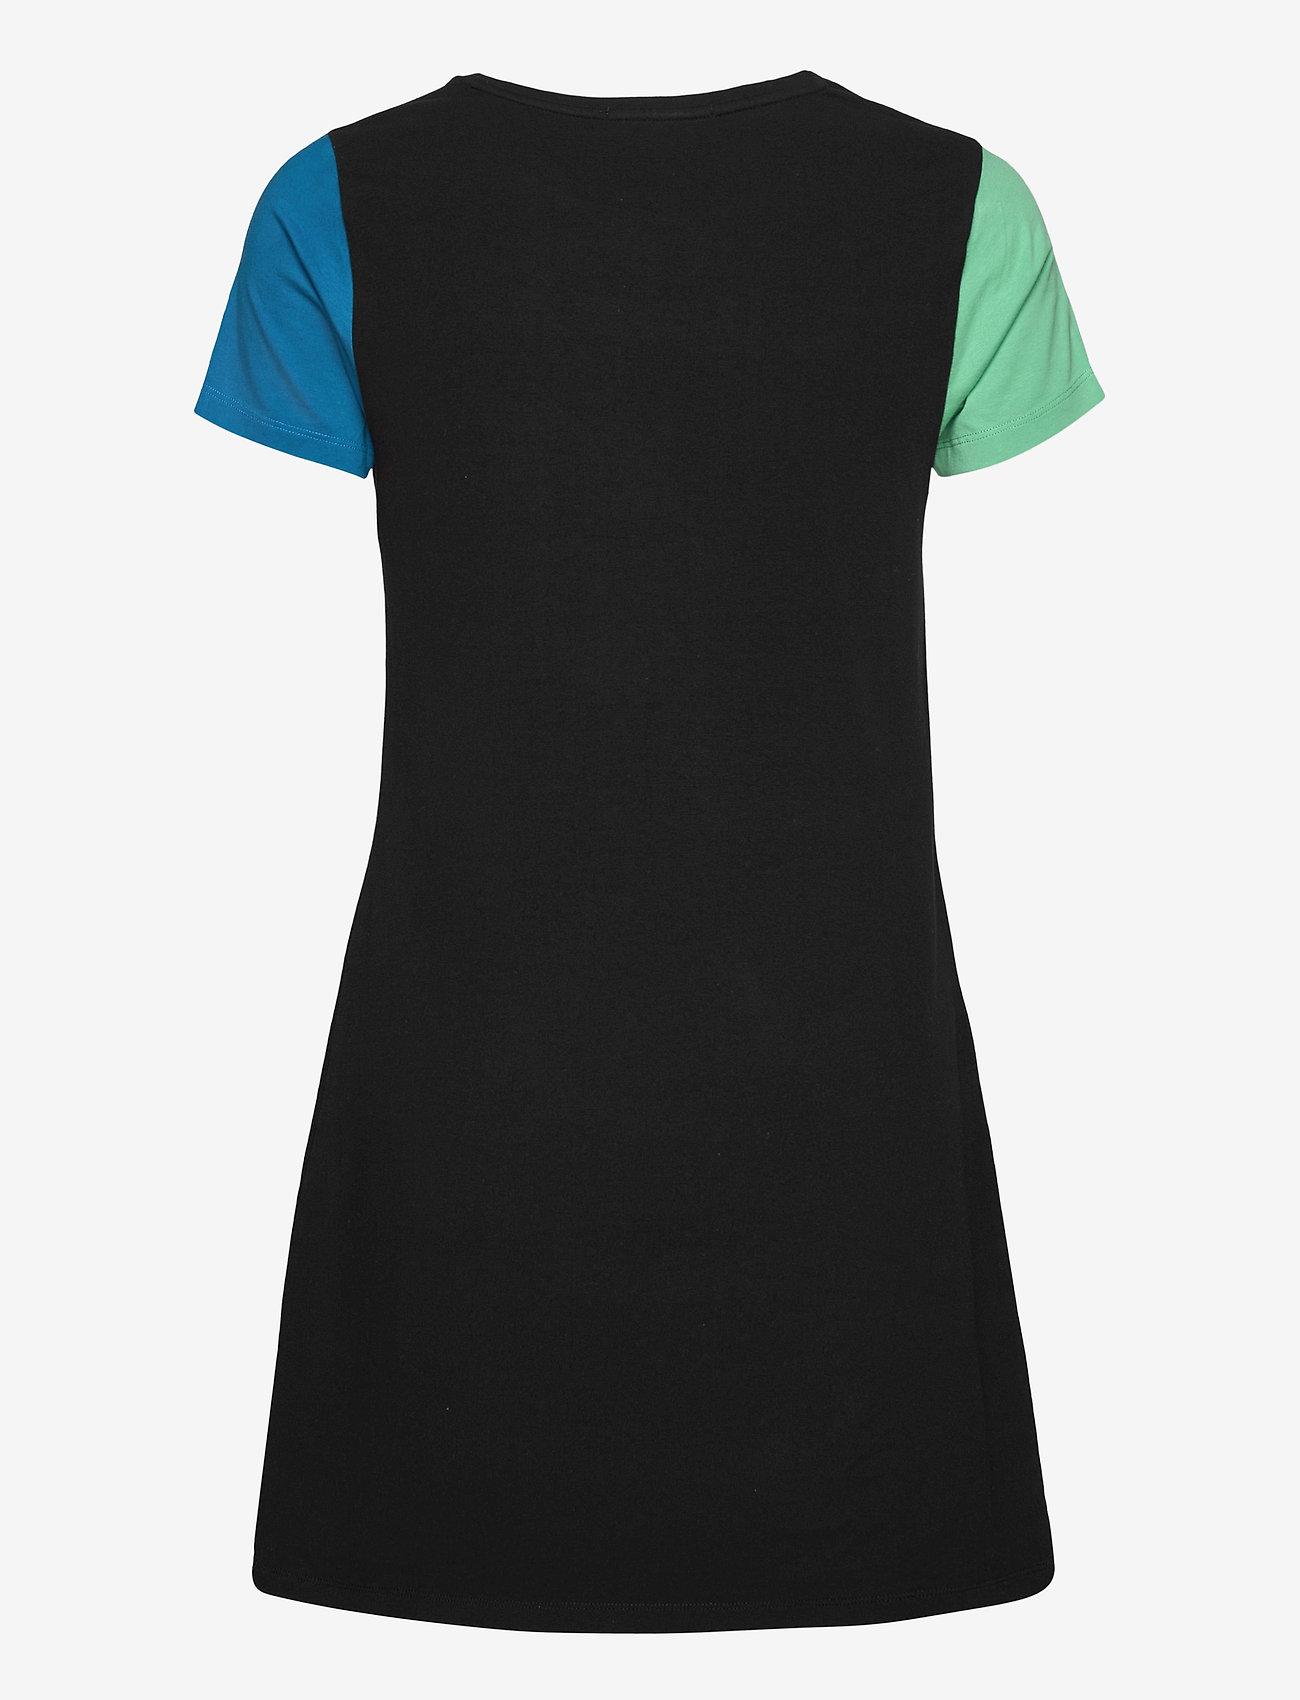 VANS - RAMP TESTED DRESS - tshirt jurken - black - 1